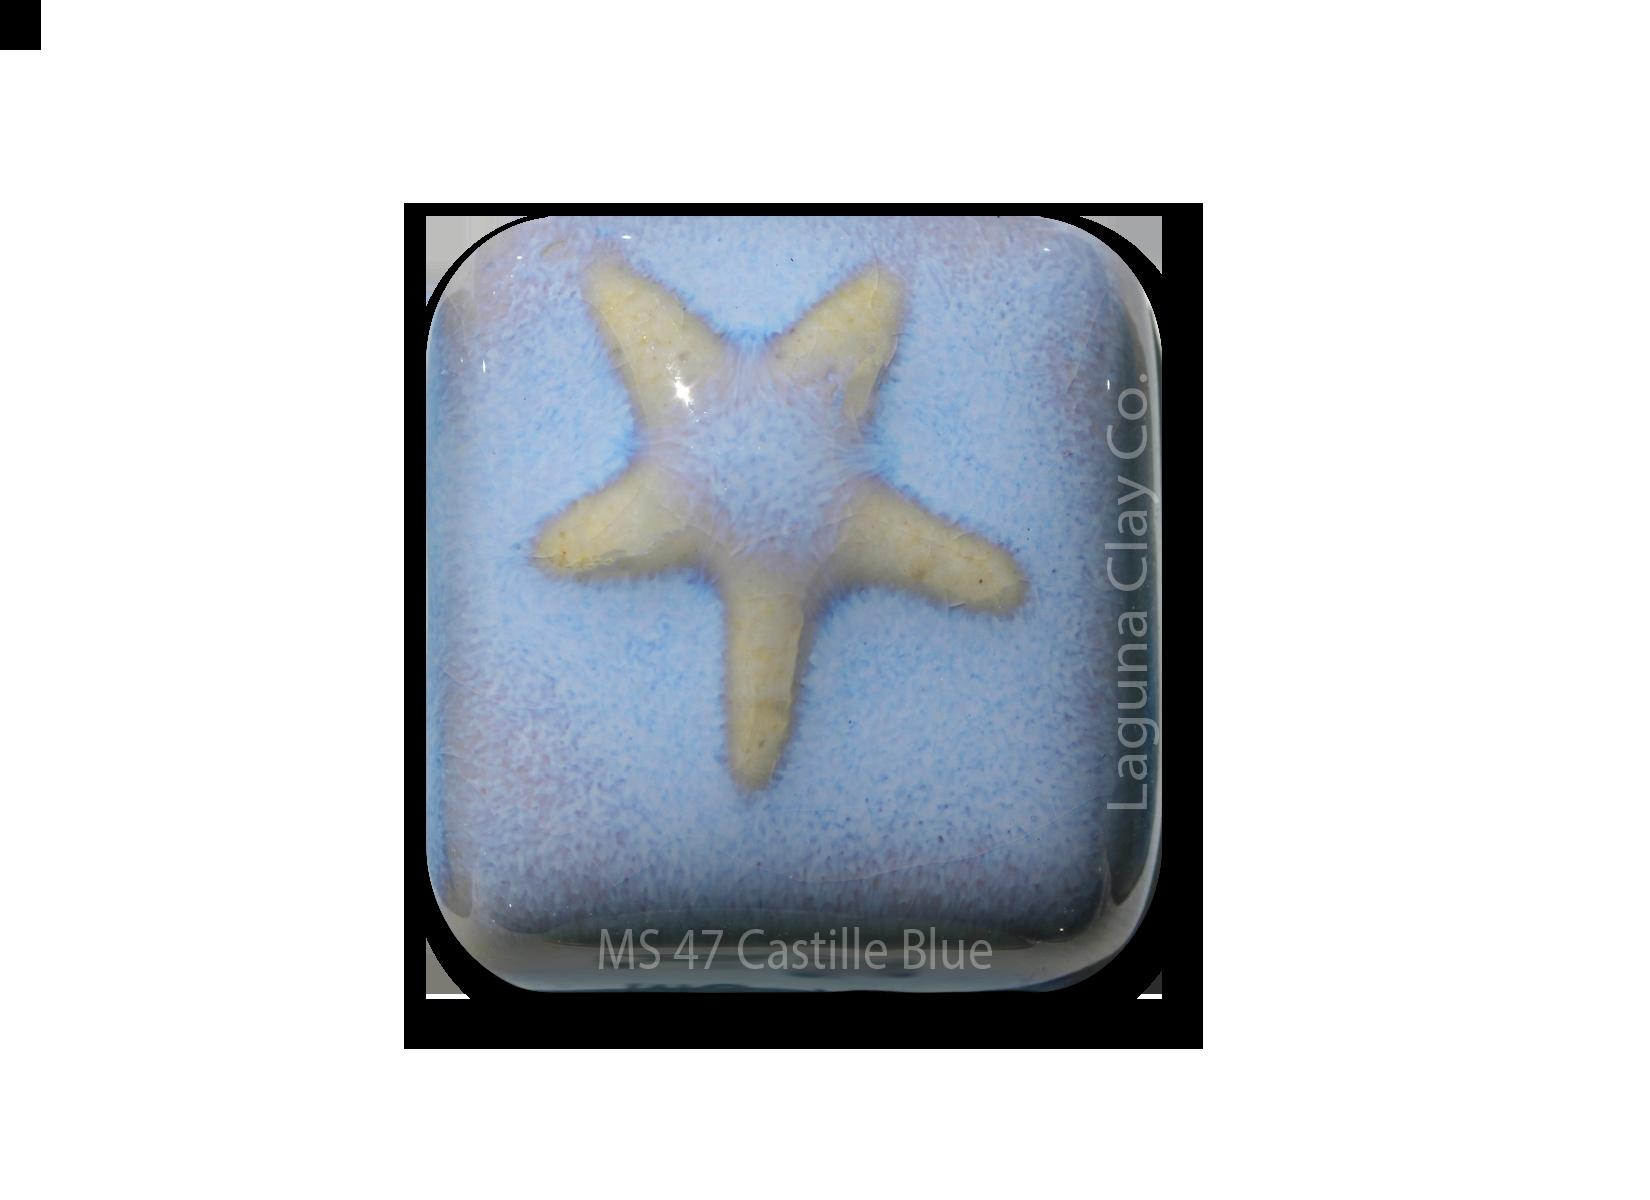 MS-47 Castille Blue